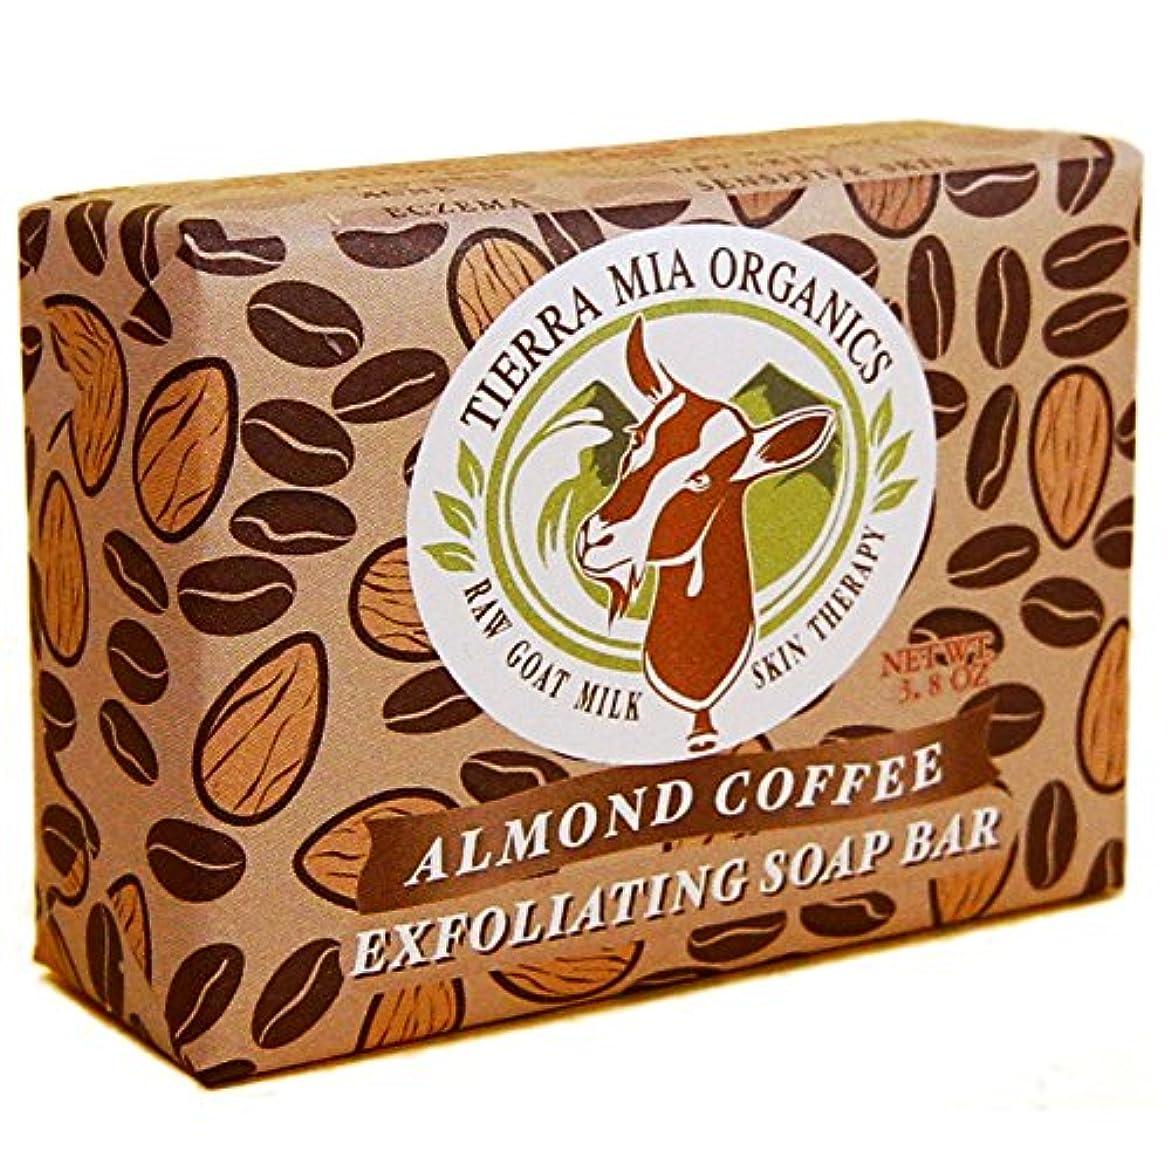 内部国歌熱心なTierra Mia Organics, Raw Goat Milk Skin Therapy, Exfoliating Soap Bar, Almond Coffee, 3.8 oz